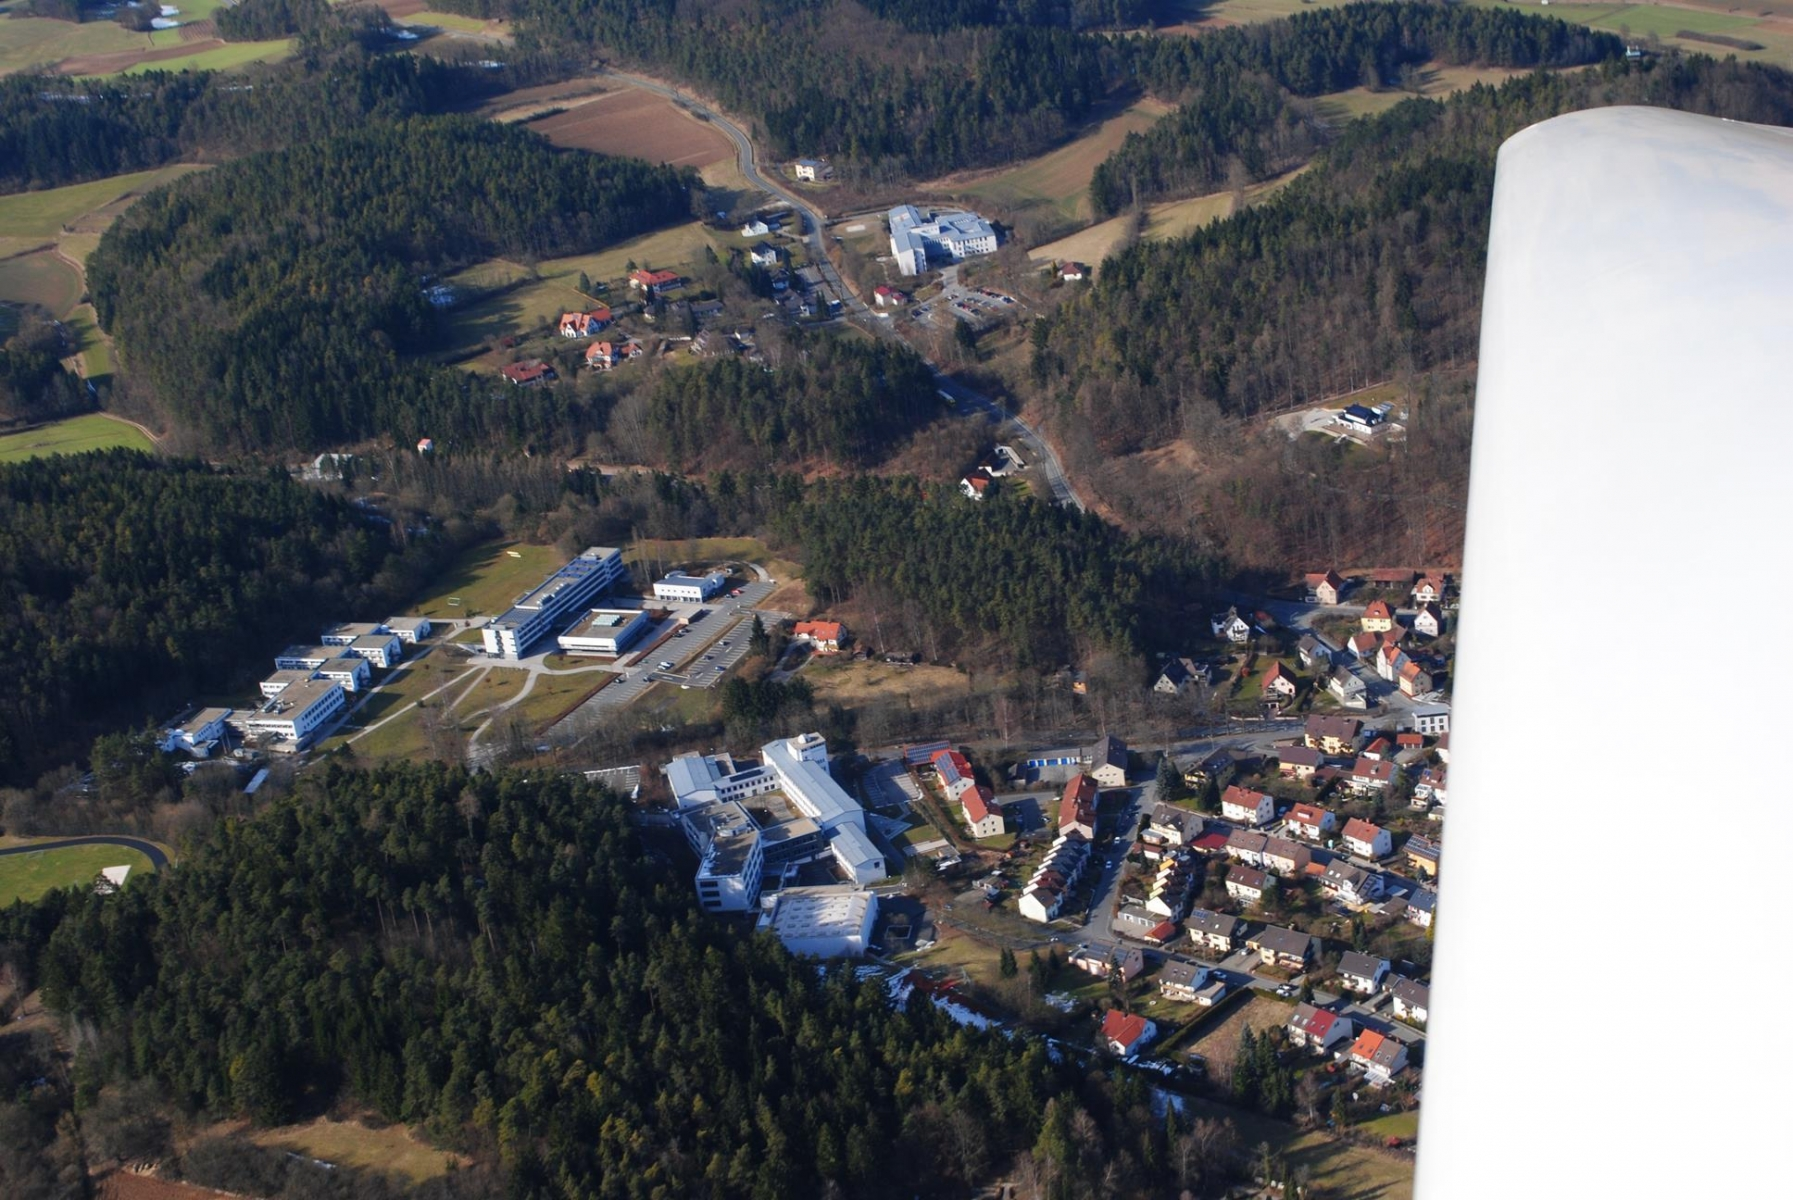 2015-03SchuleVonOben (17) (Copy)